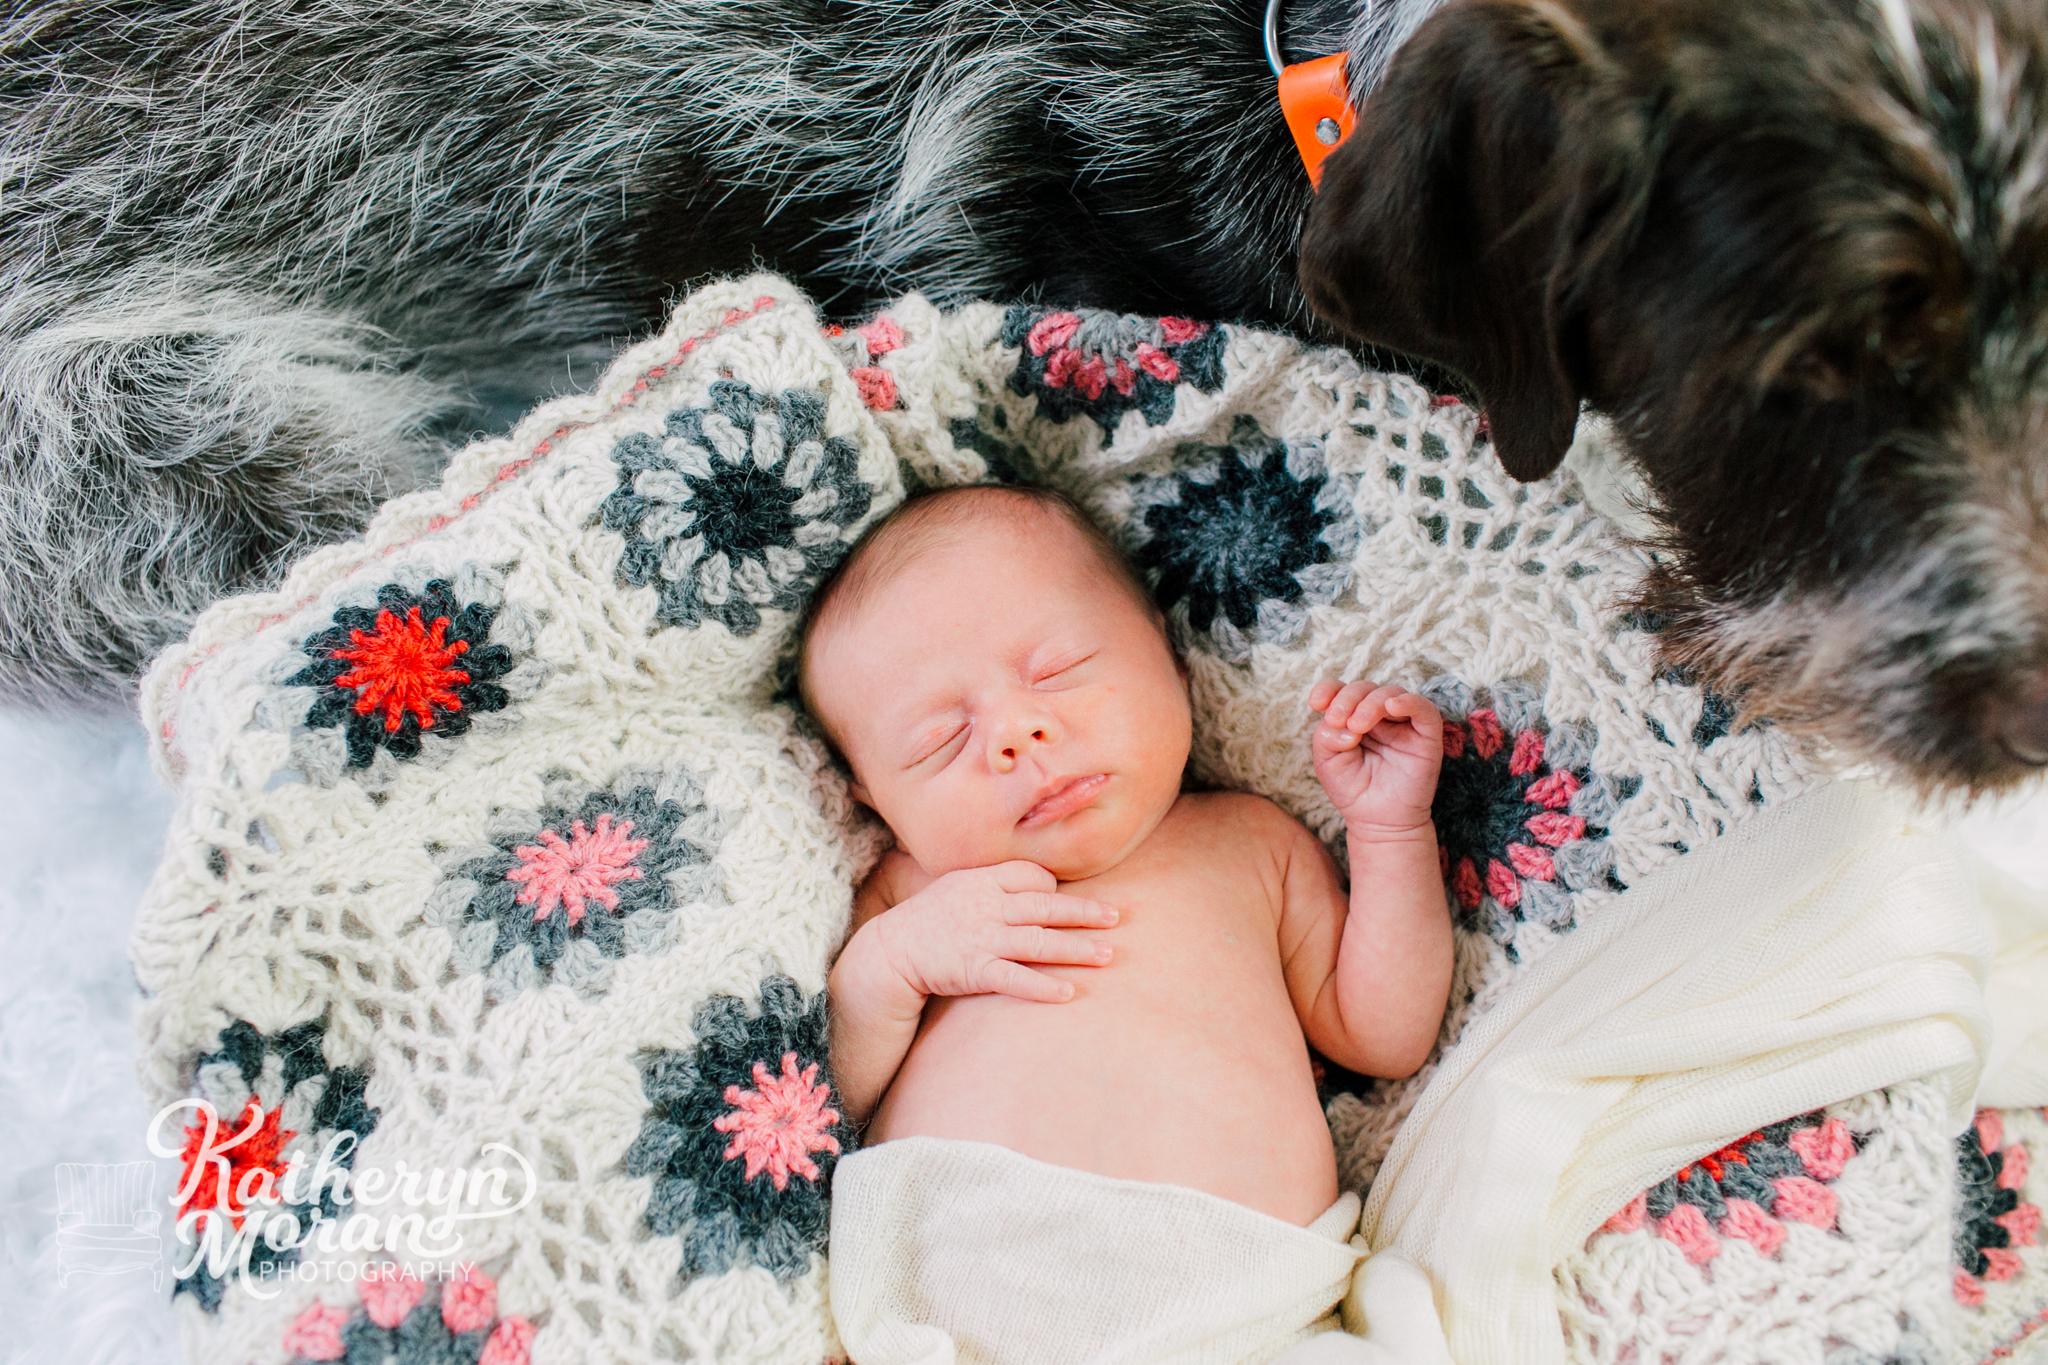 seattle-newborn-photographer-katheryn-moran-avery-malaspino-9-2.jpg